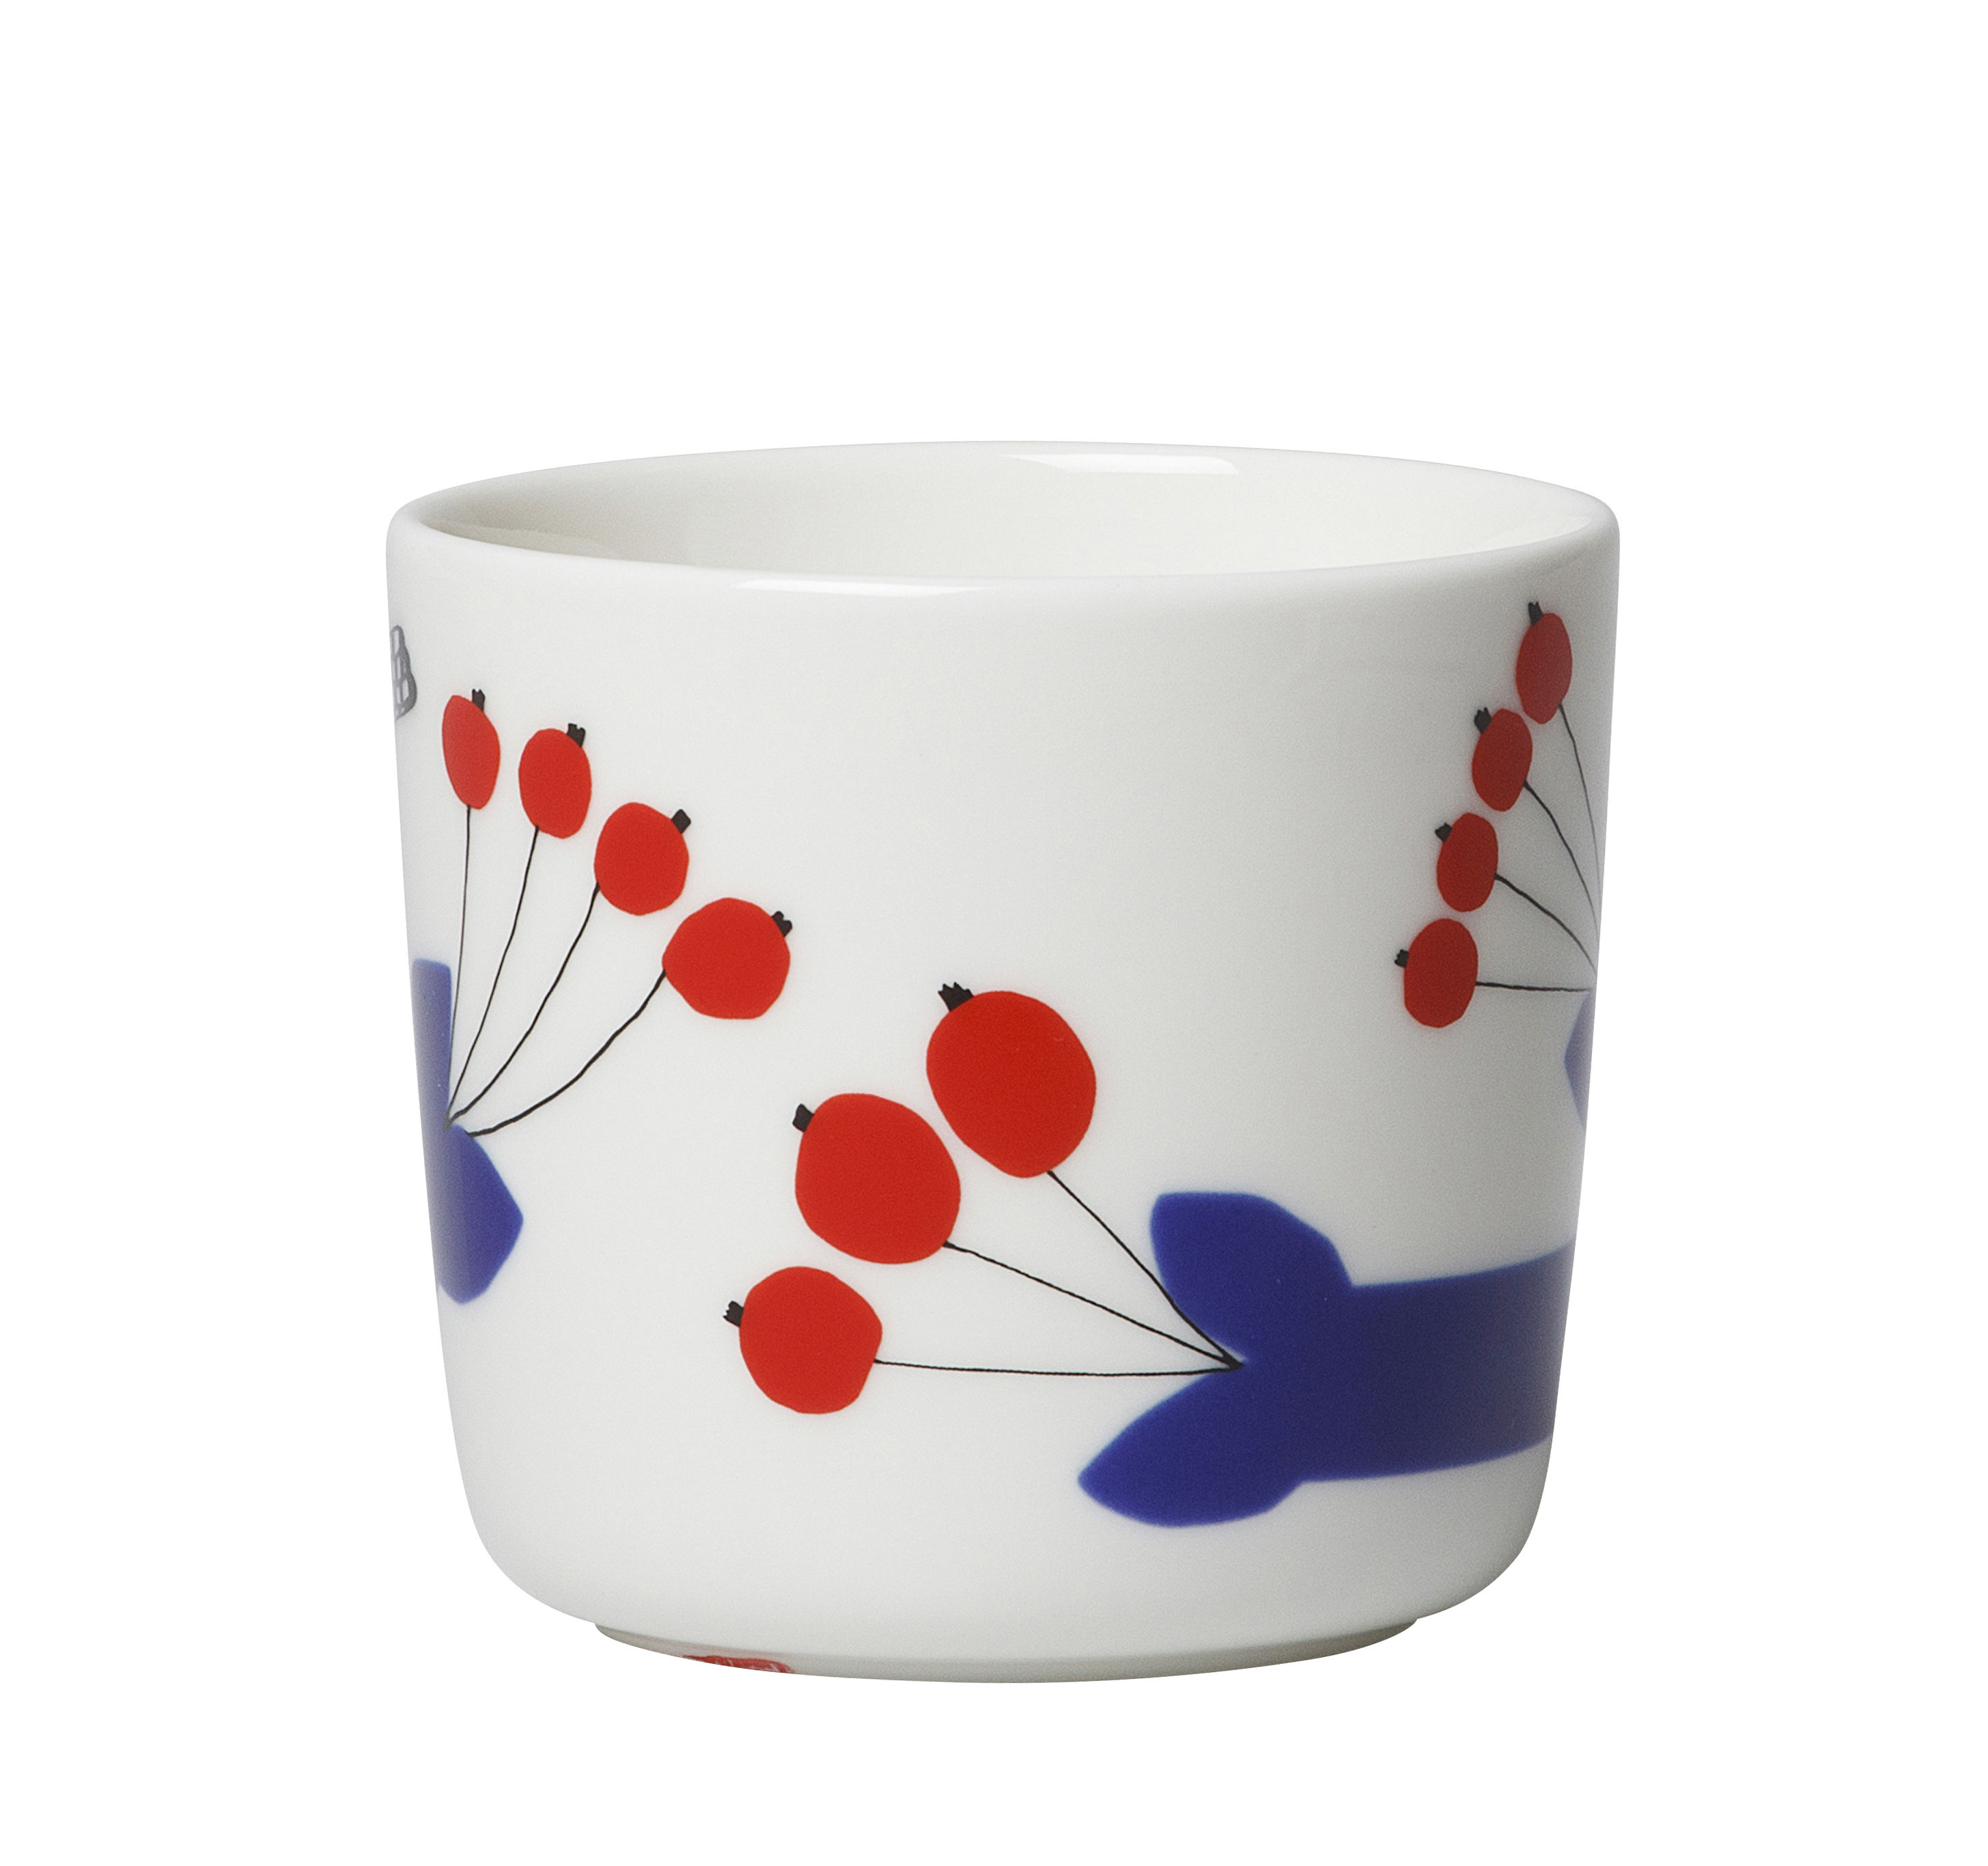 pakkanen kaffeetasse ohne henkel 2er set pakkanen. Black Bedroom Furniture Sets. Home Design Ideas